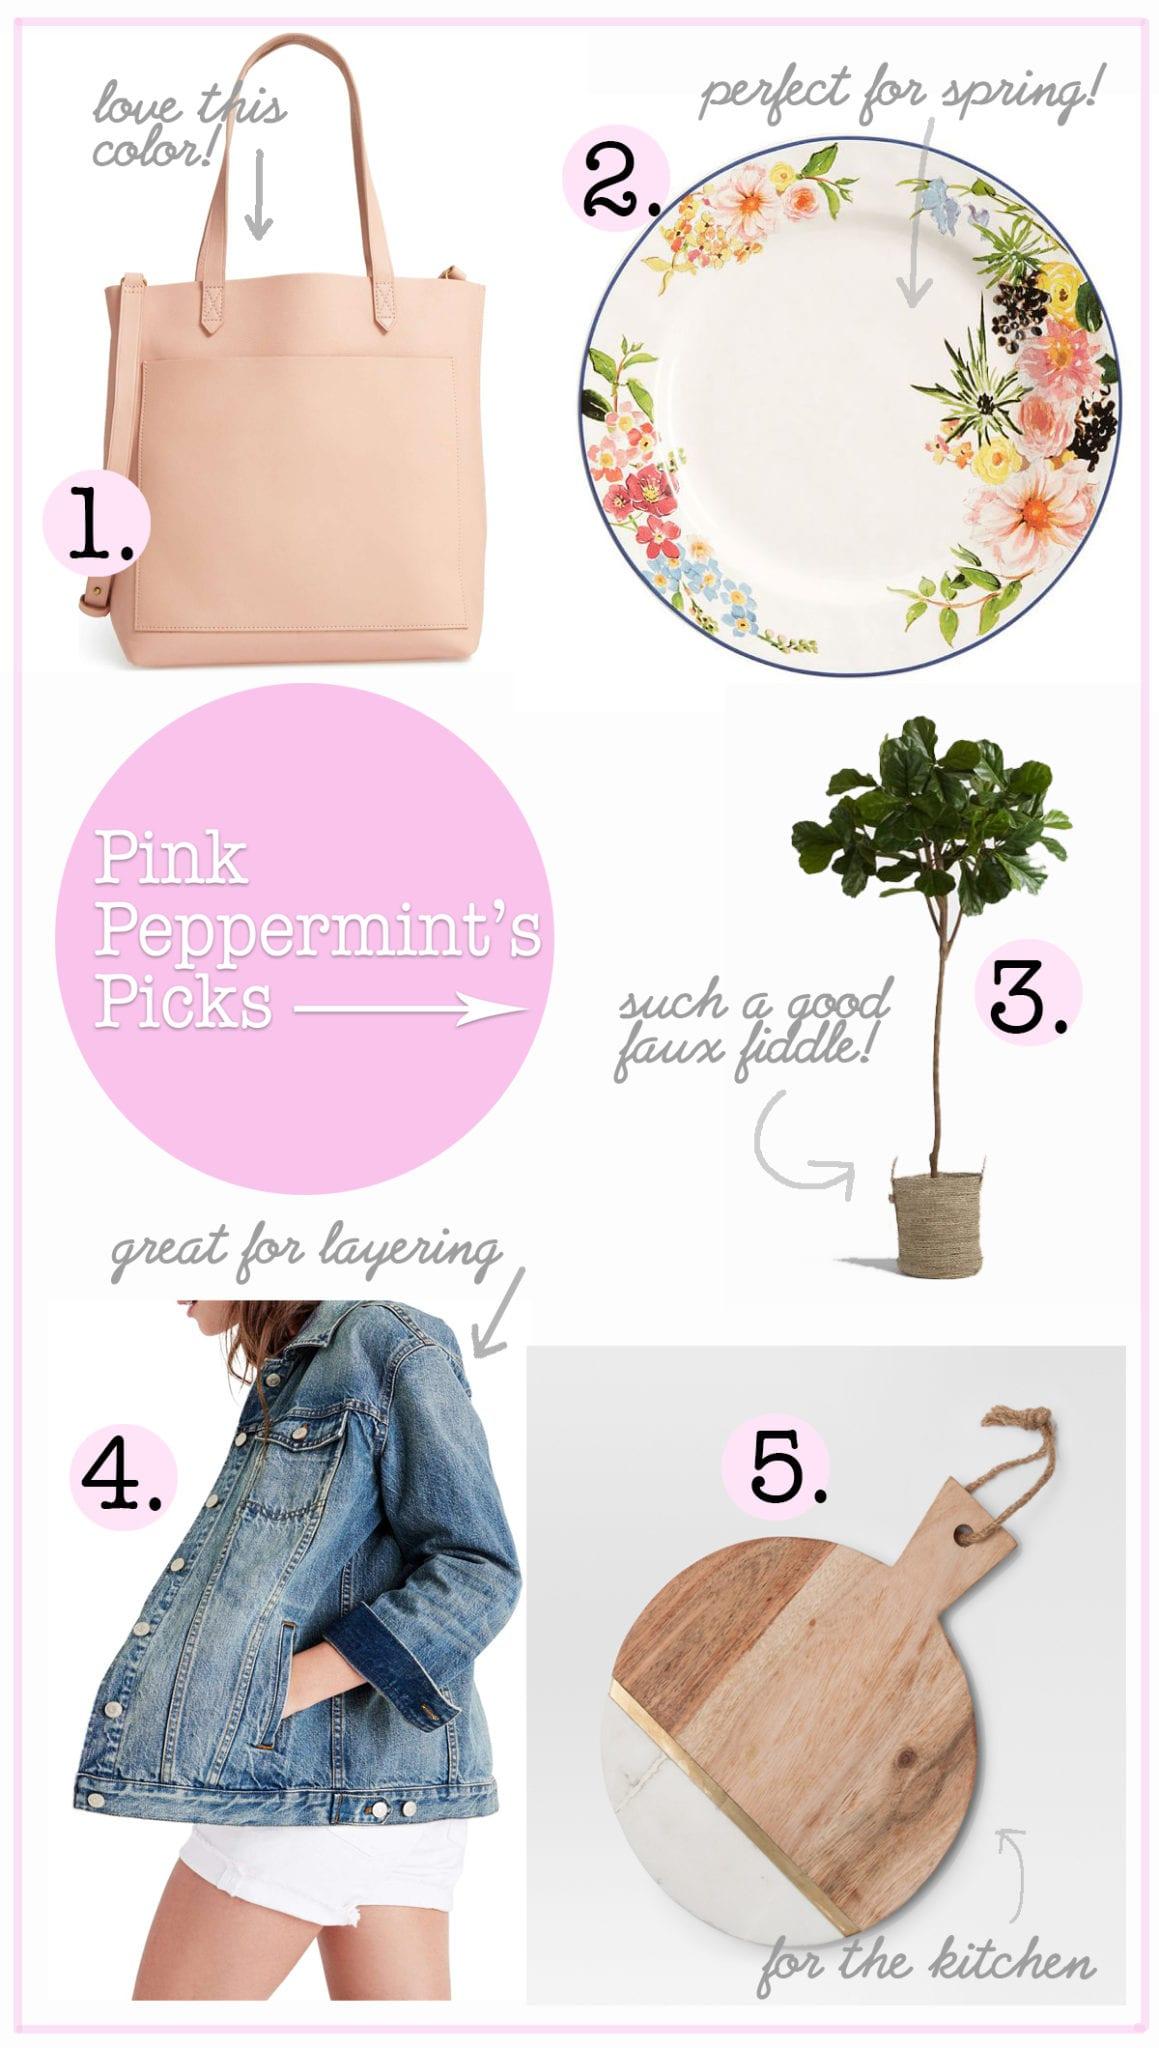 Pink peppermints picks feb 14th